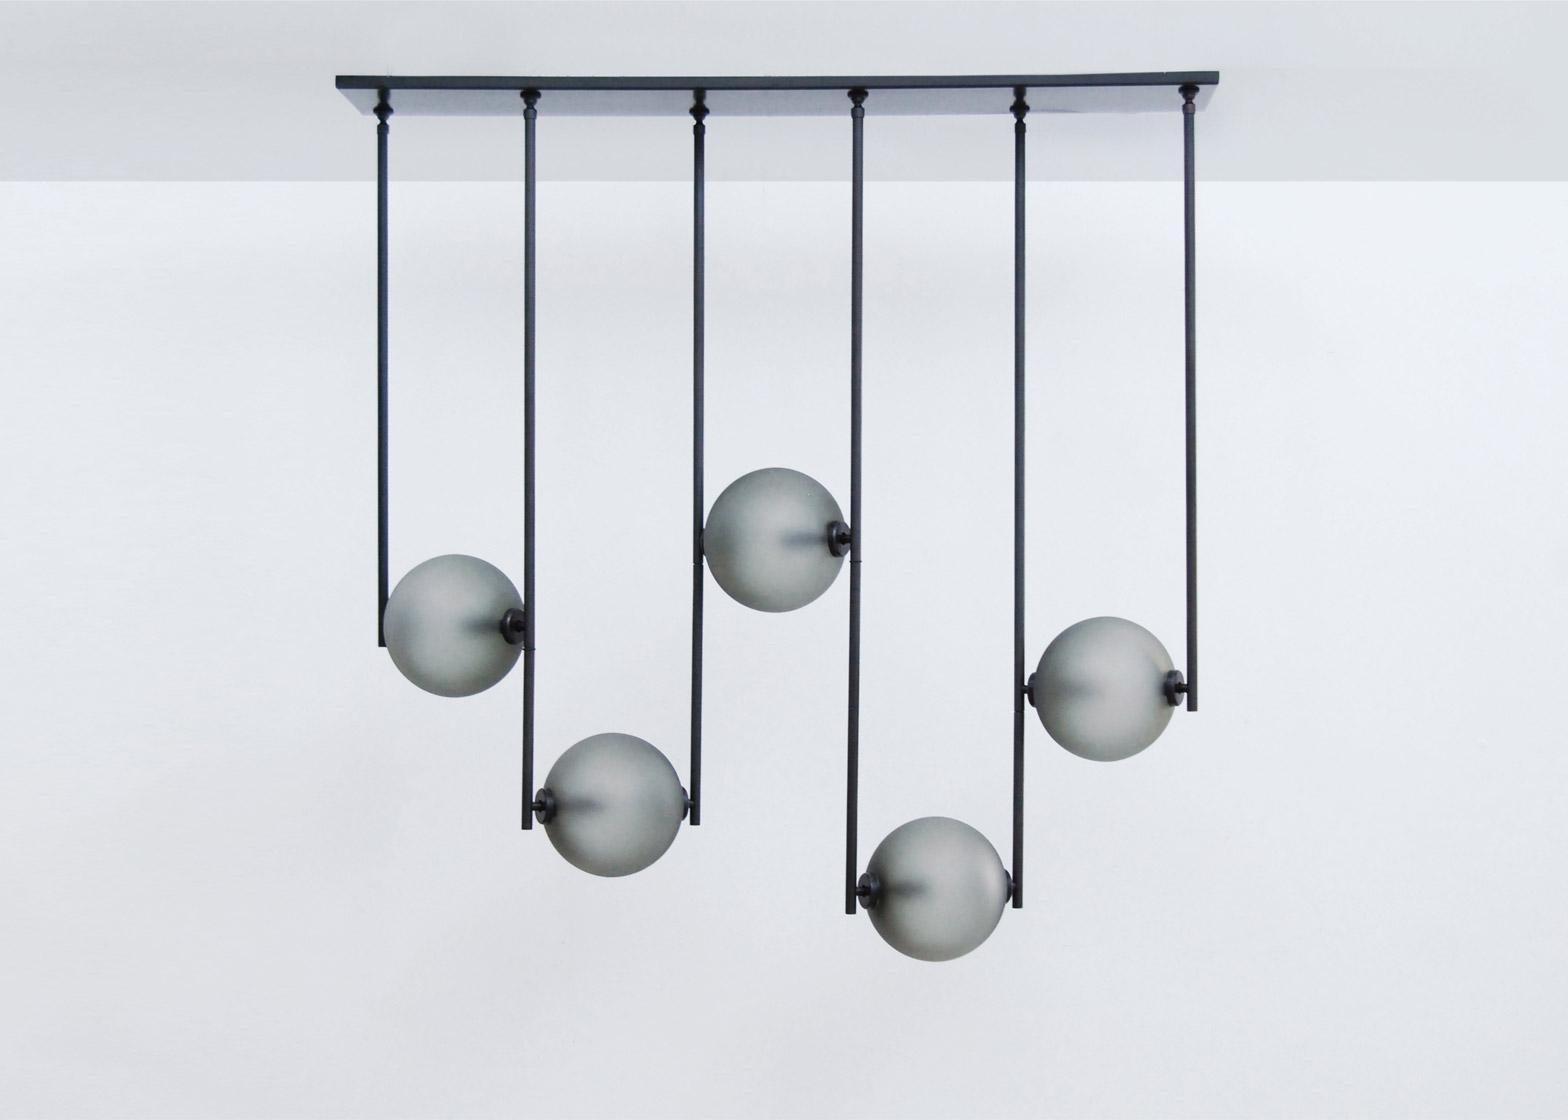 future designs lighting. 6 Of 6; Future Perfect Lighting By John Hogan For New York Design Week 2016 Designs